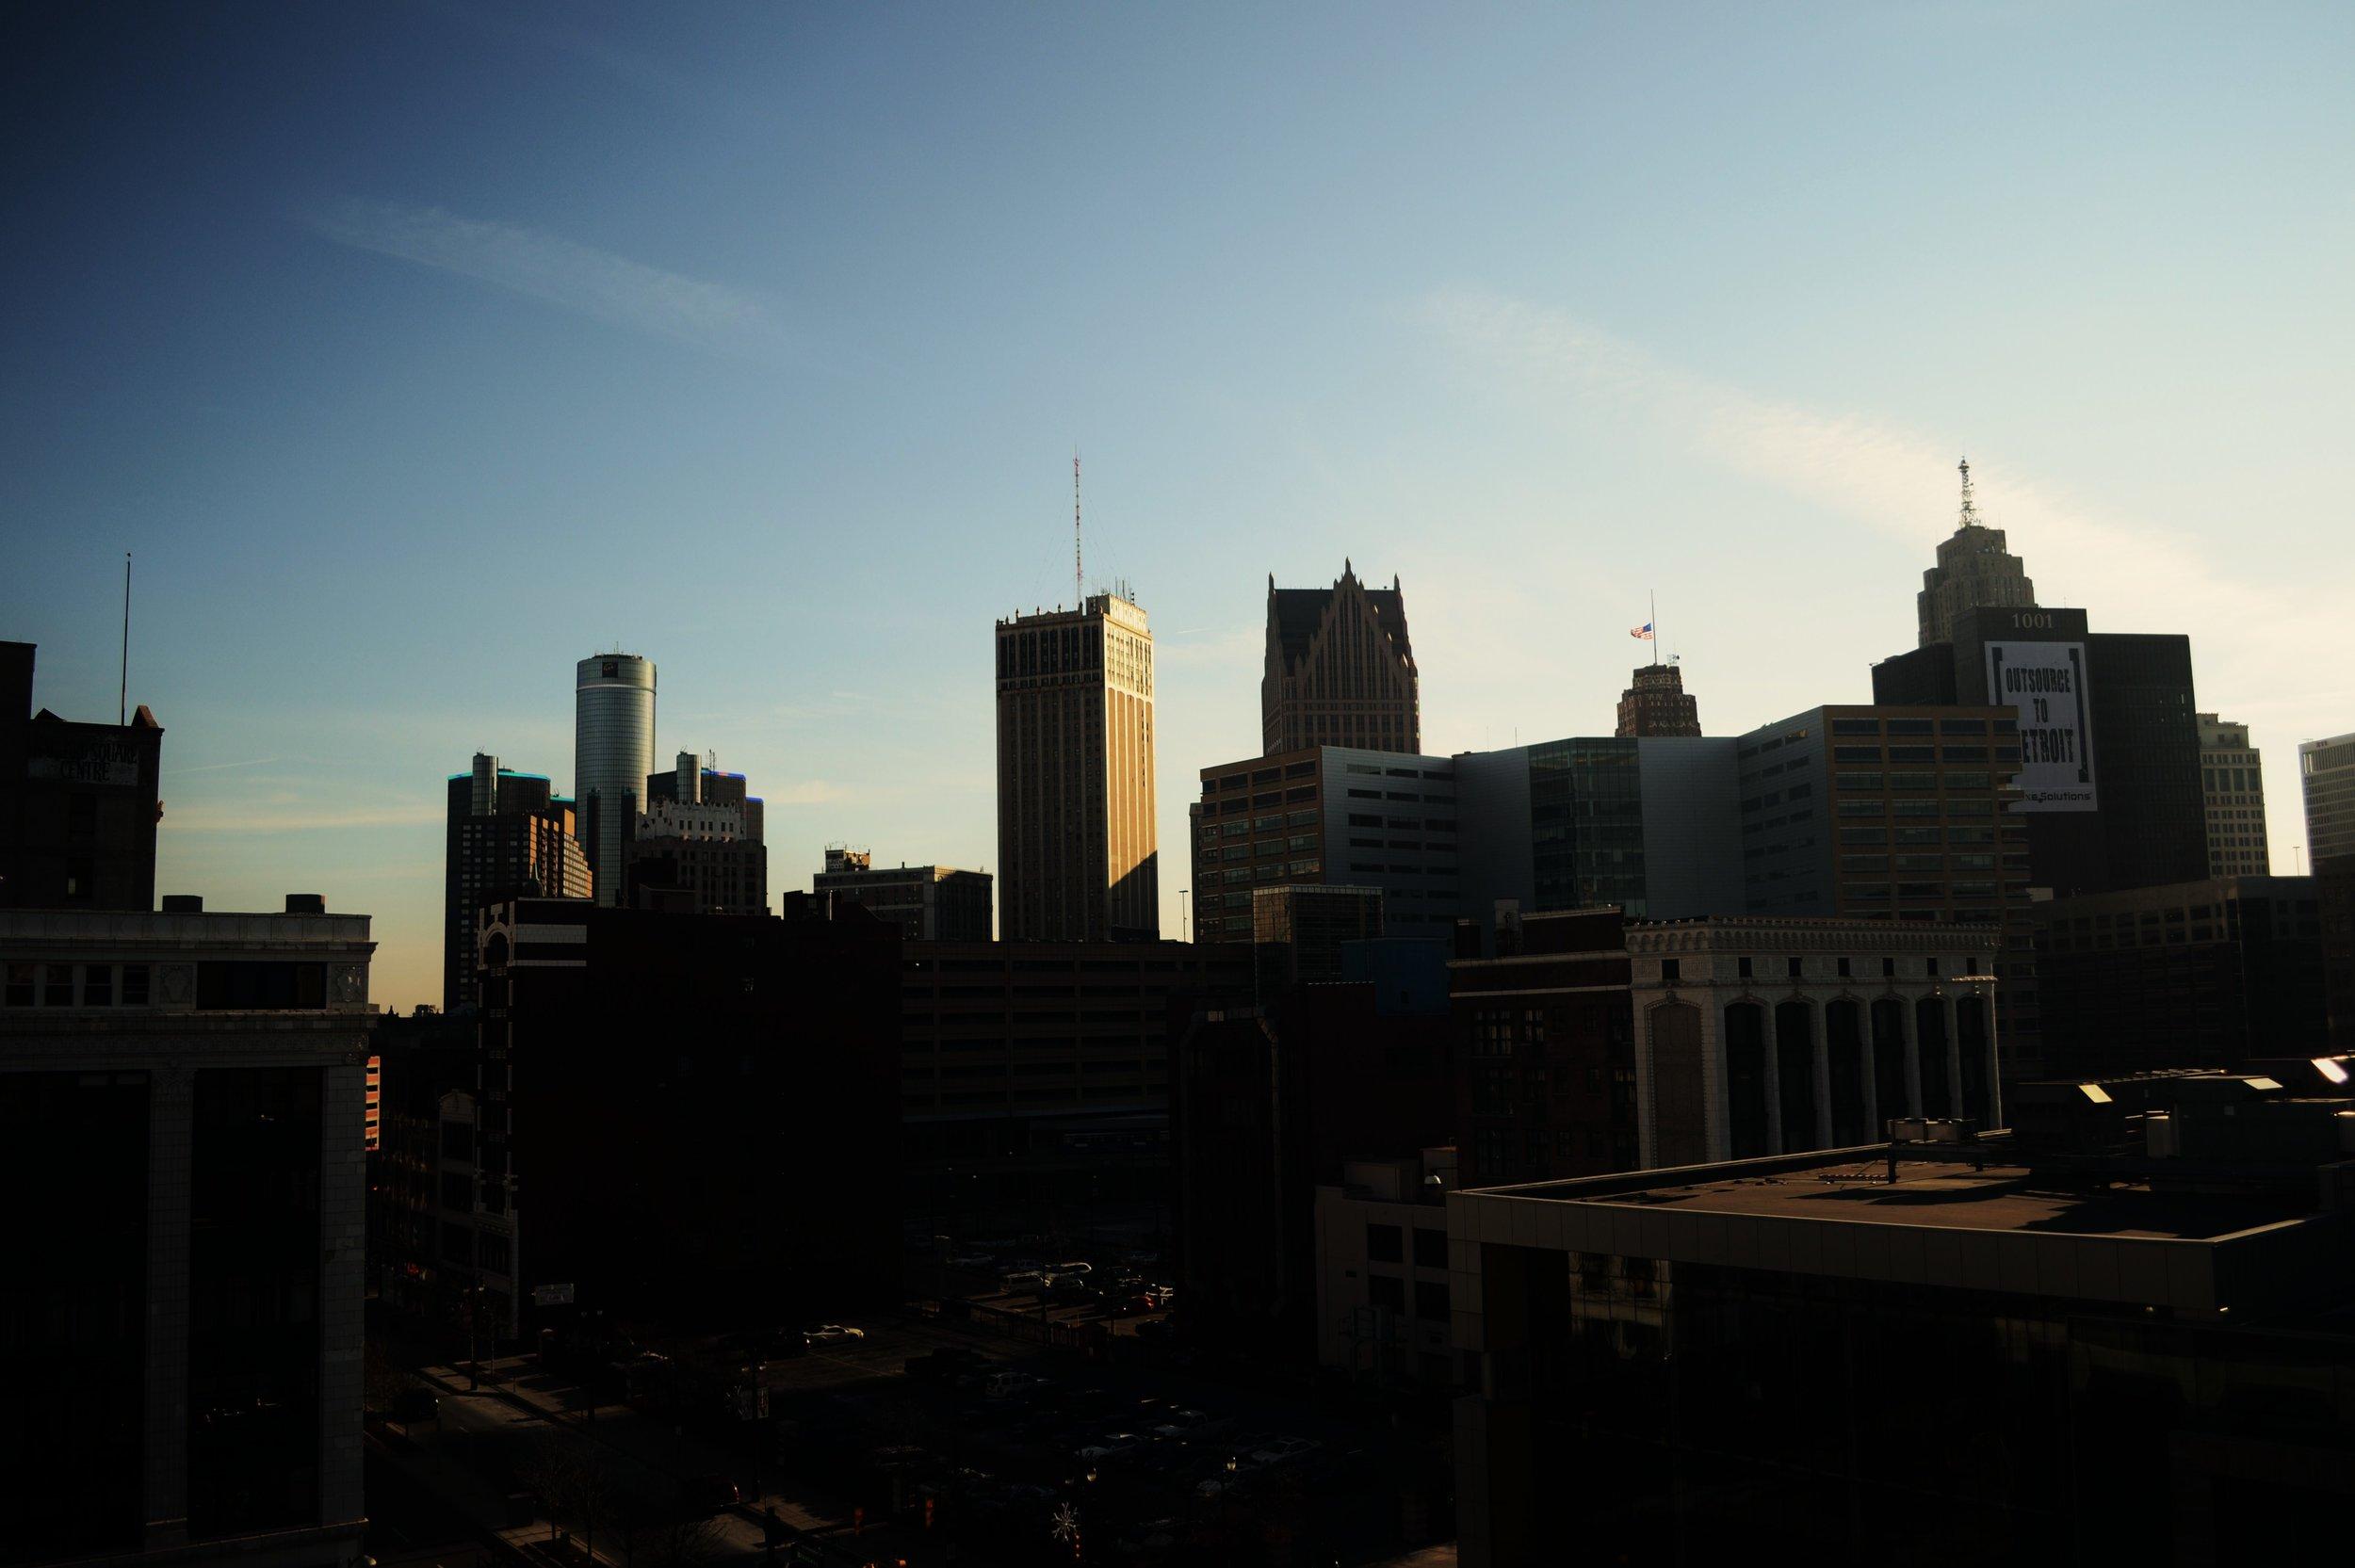 Dec. 12, 2011